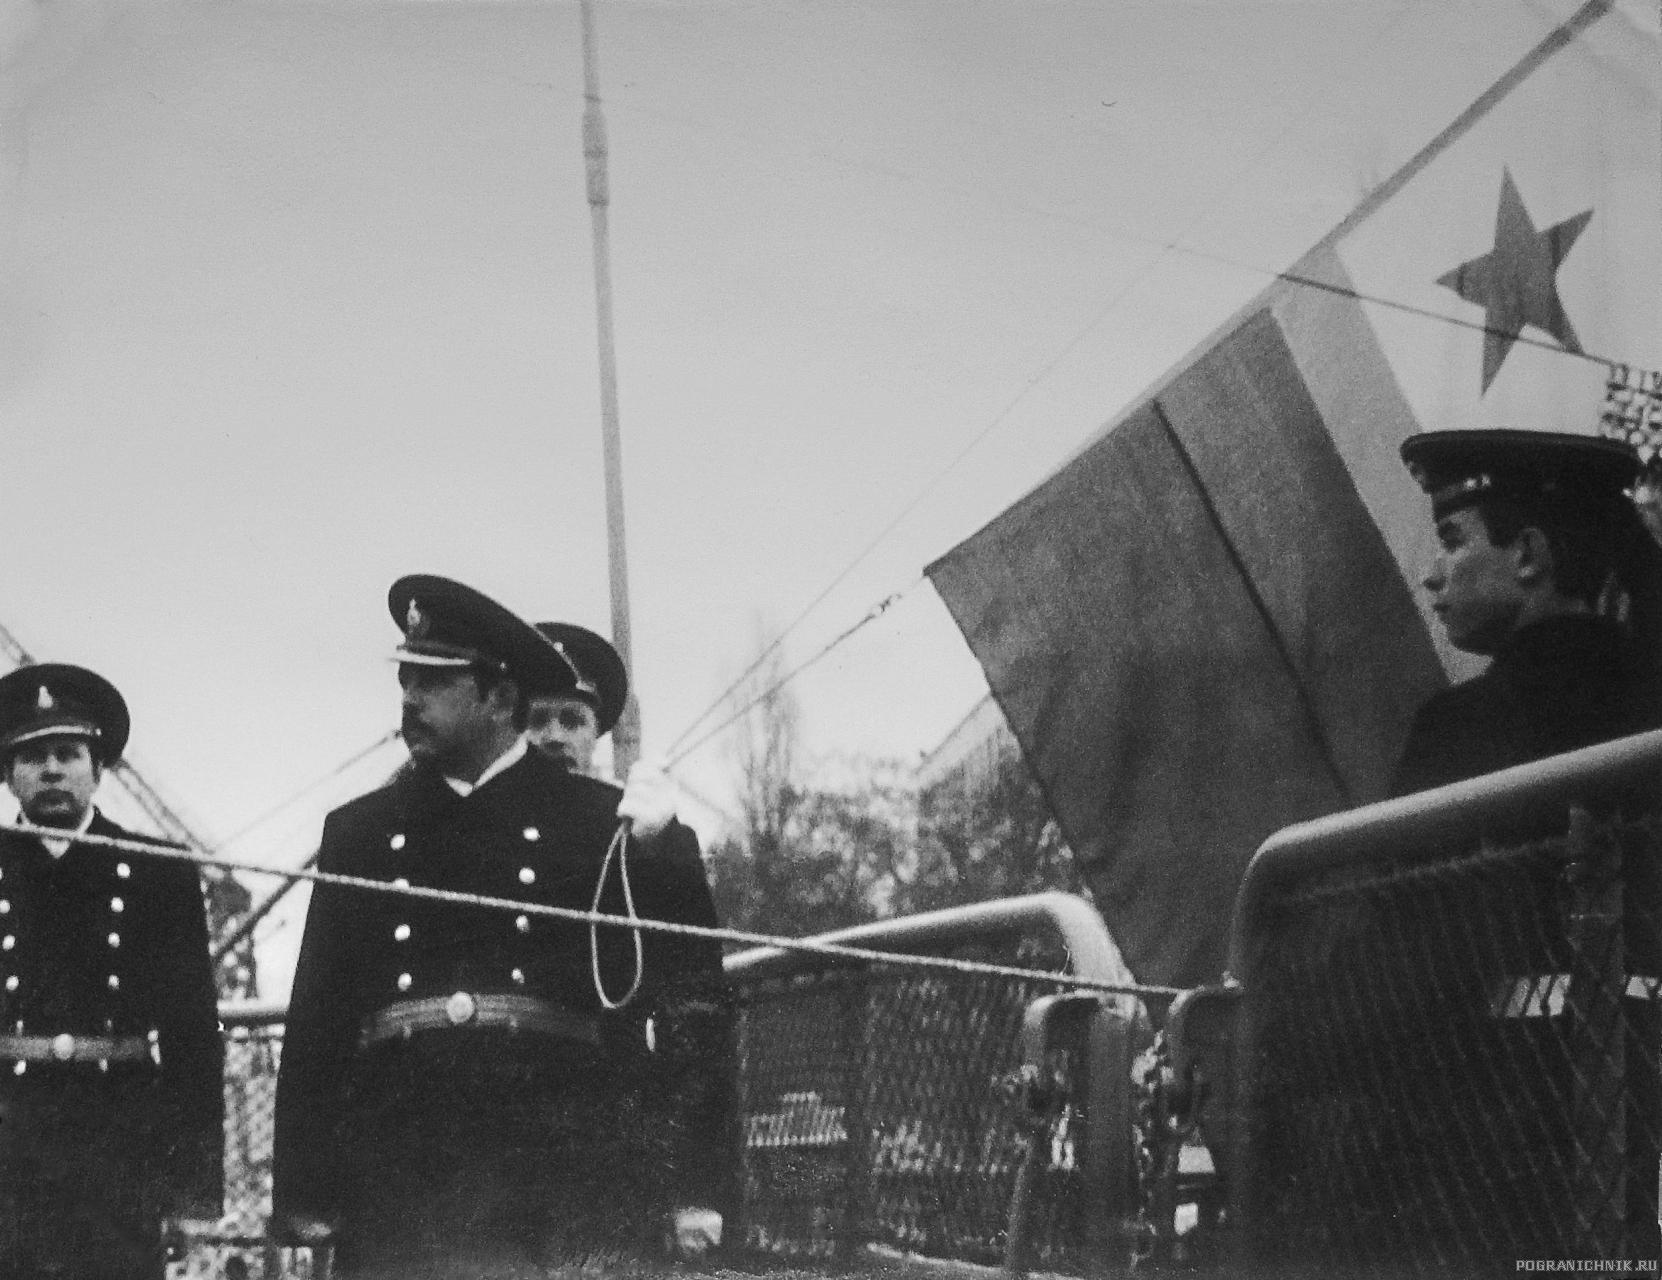 Первое поднятие  флага МЧПВ на корабле.